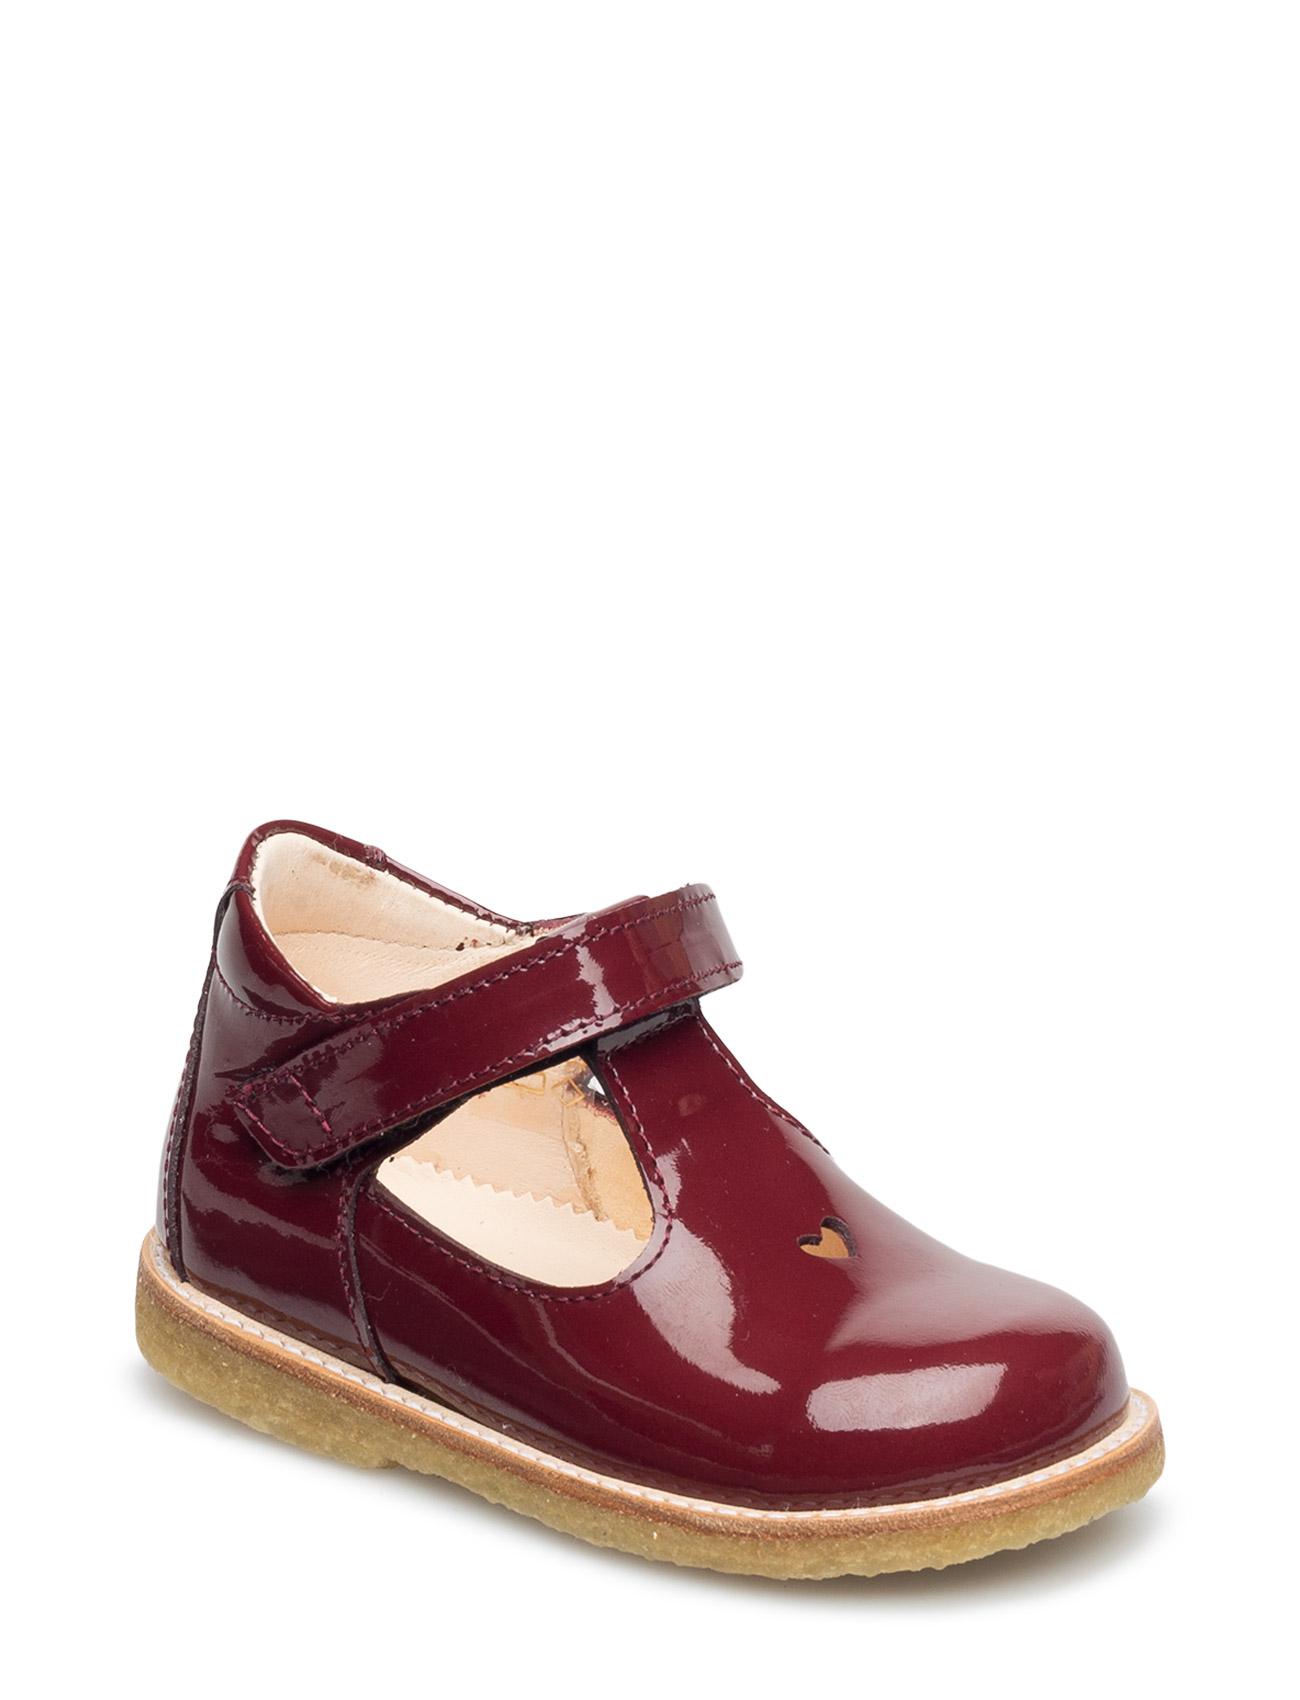 80215660199f 3267 ANGULUS Sko   Sneakers til Børn i